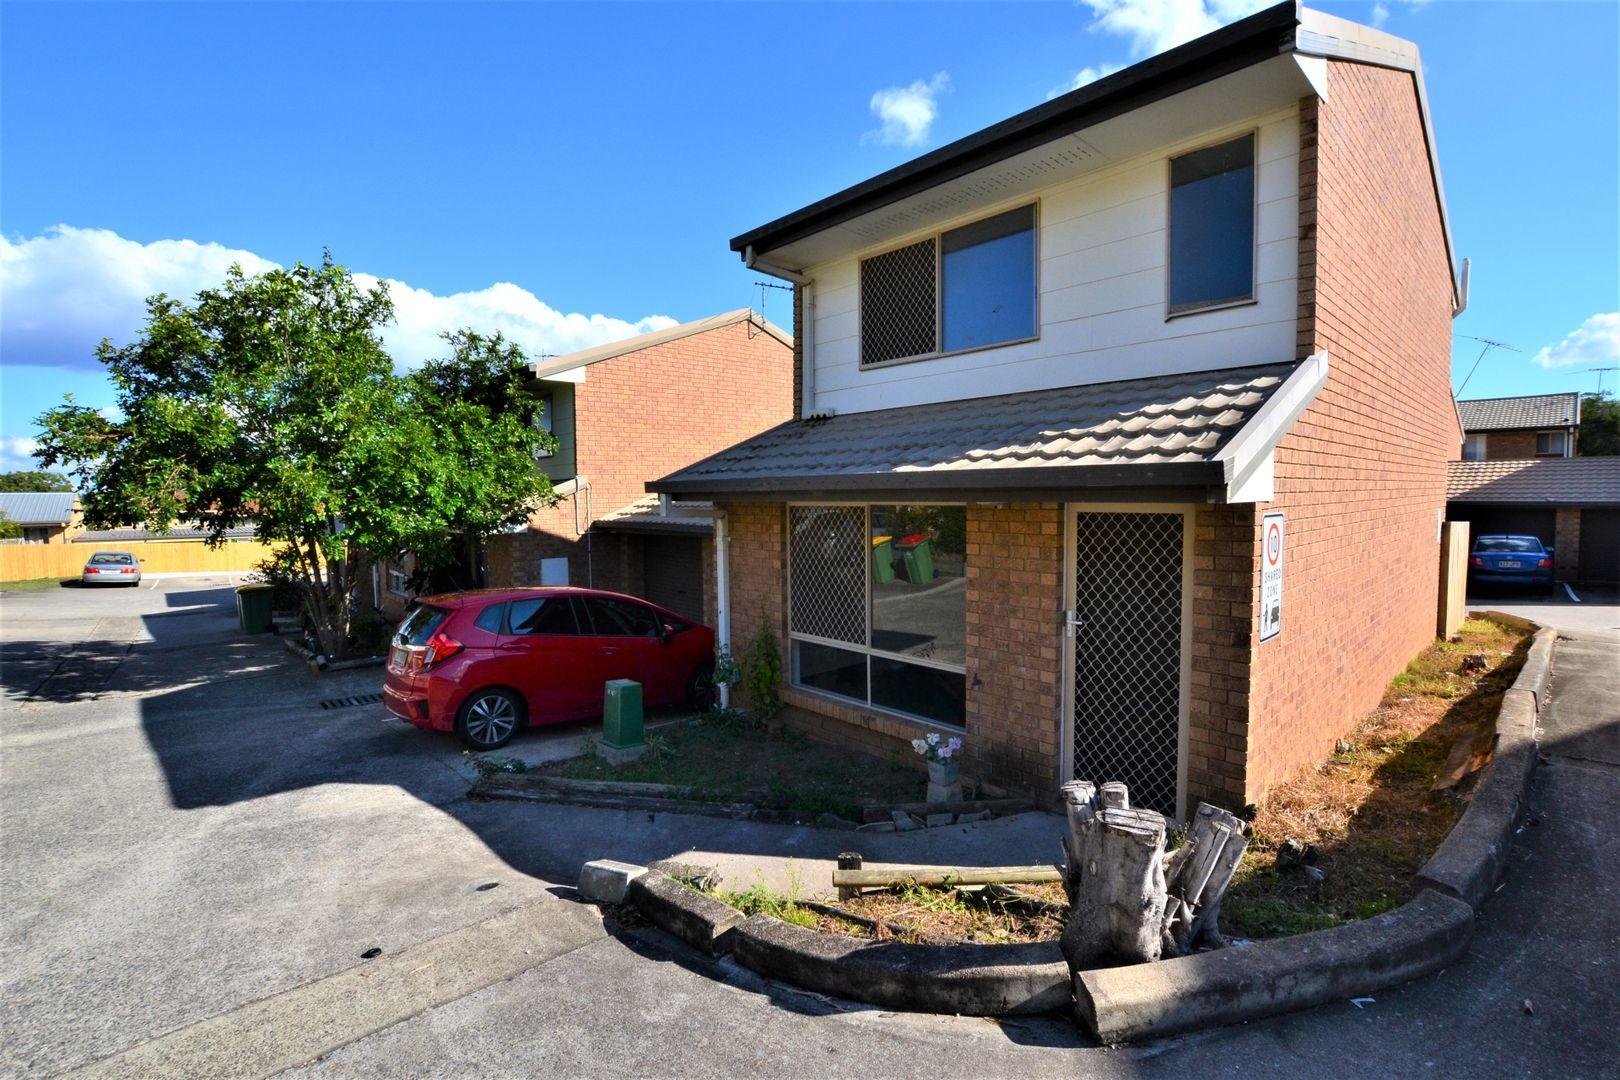 14/96 Smith Road, Woodridge QLD 4114, Image 0